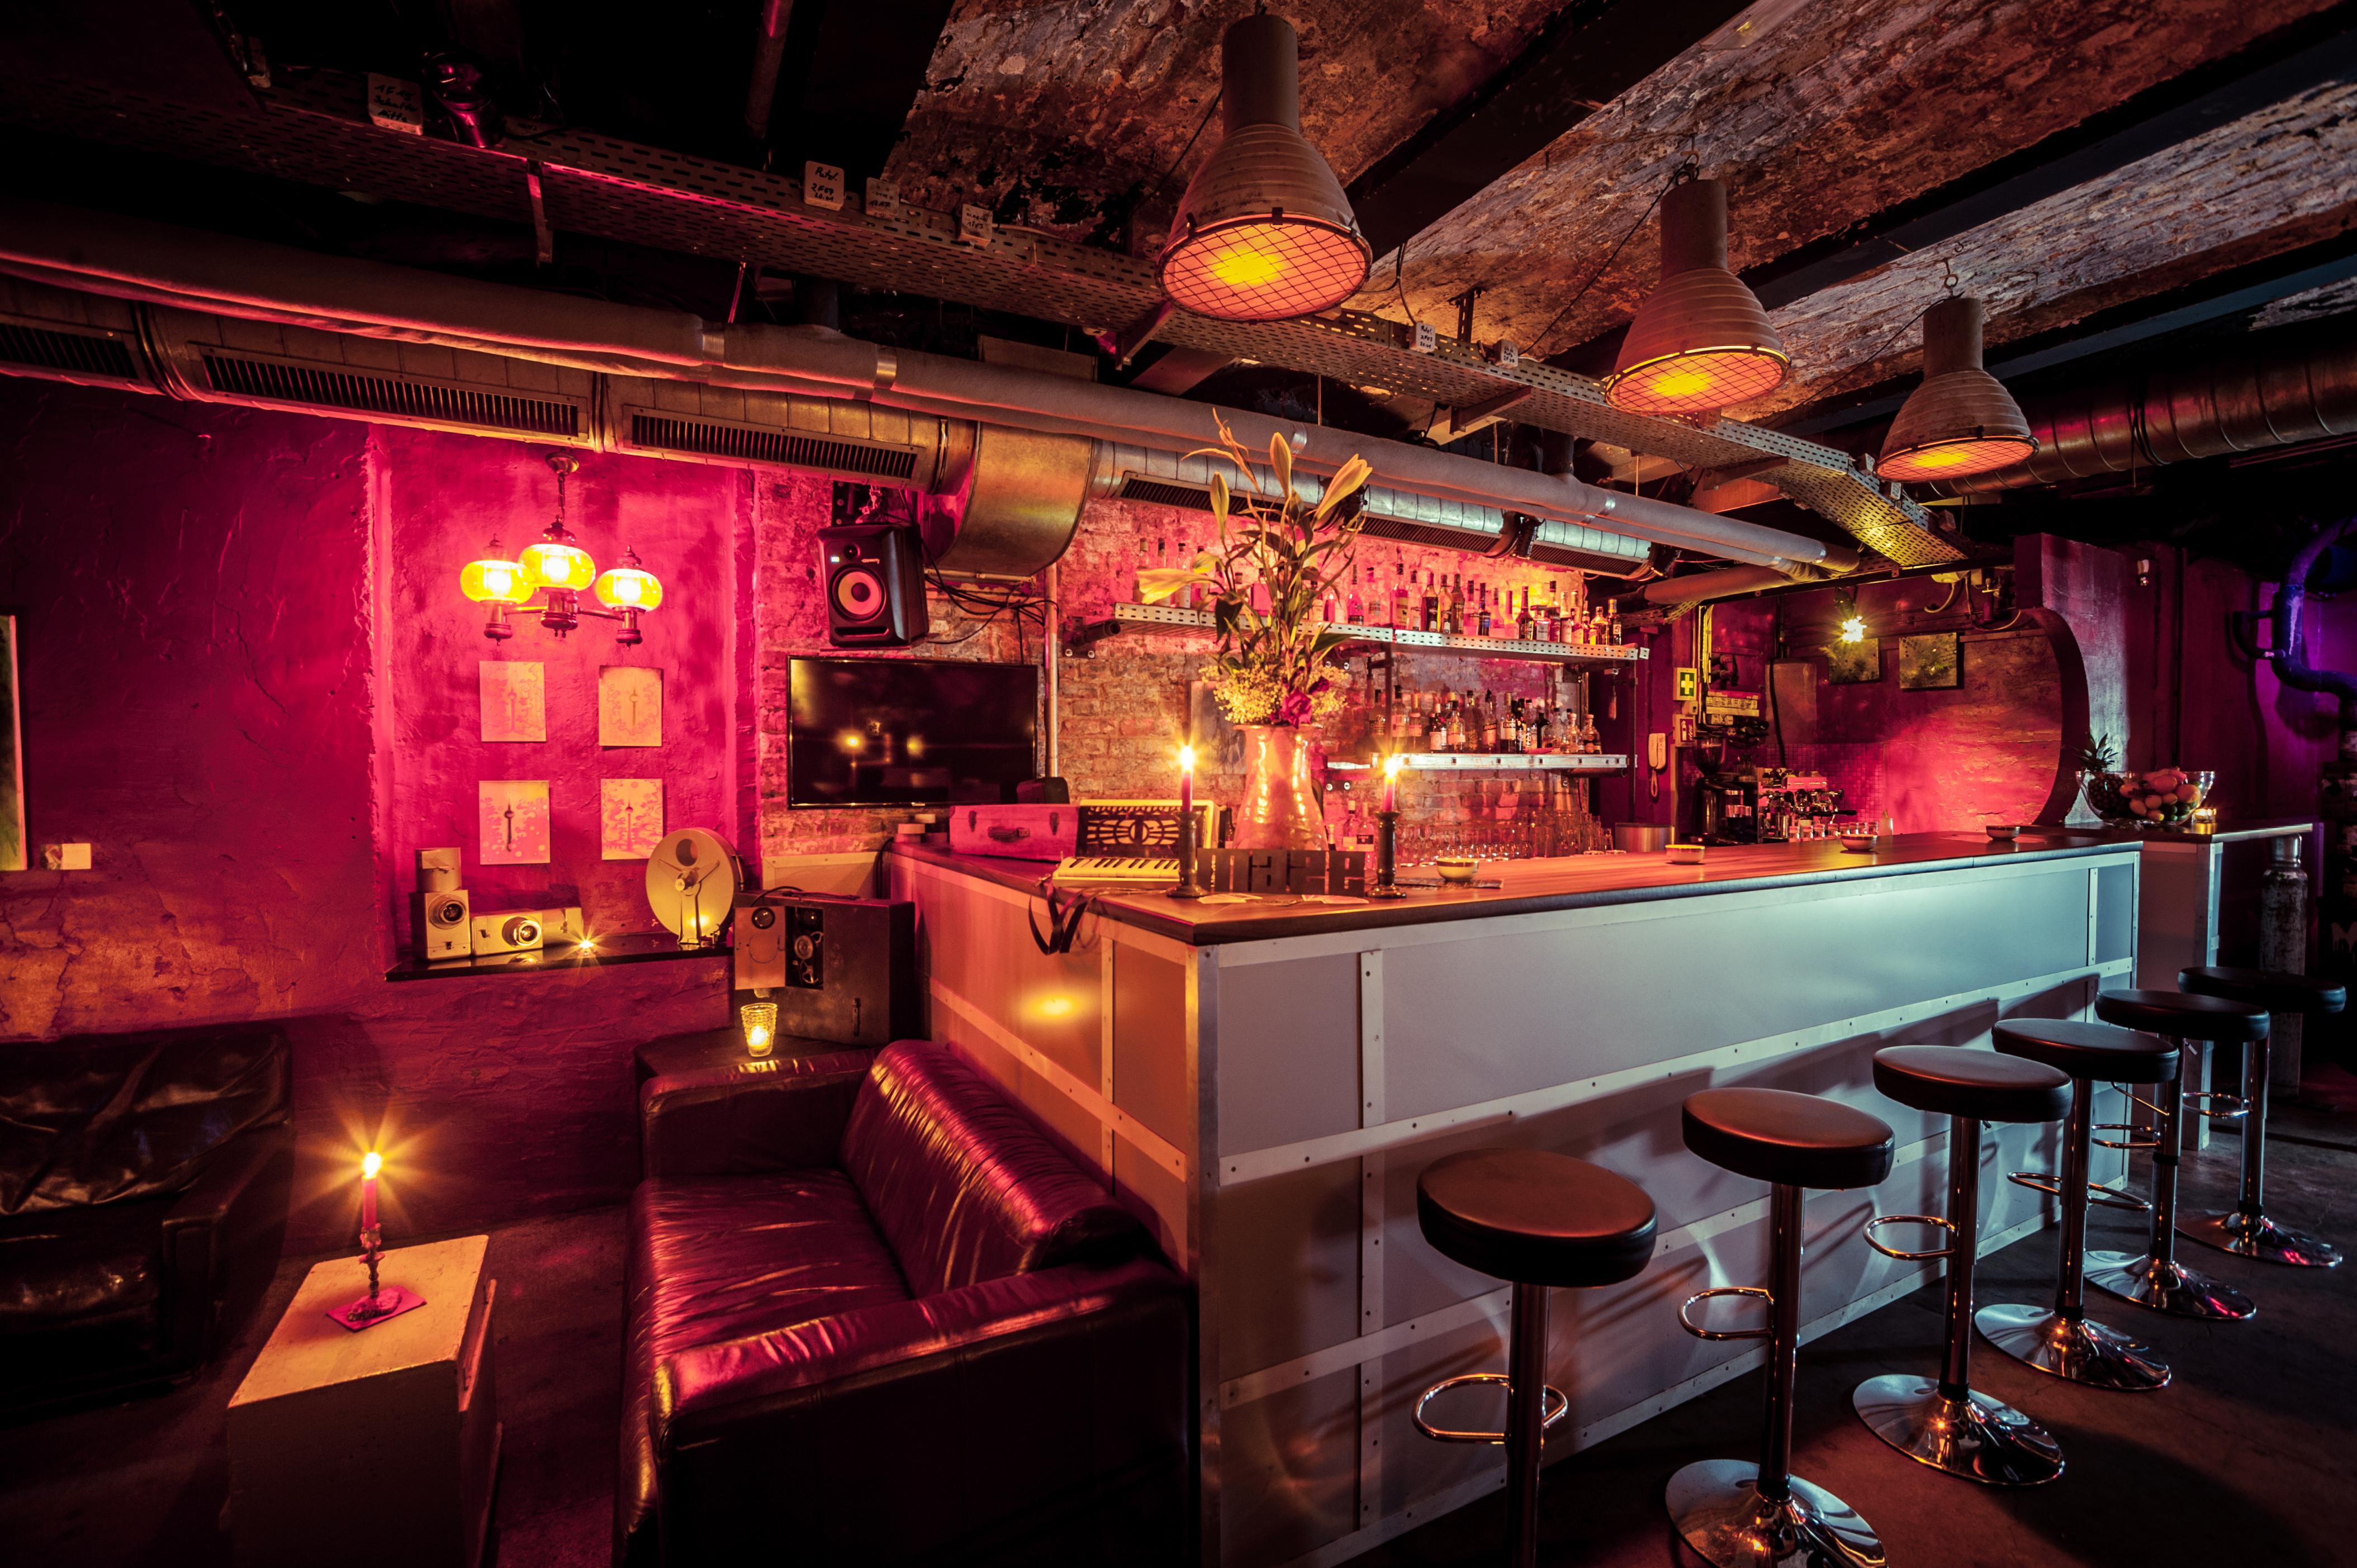 Wohnzimmer Bar Berlin Helmholtzplatz Jtleigh Hausgestaltung Ideen